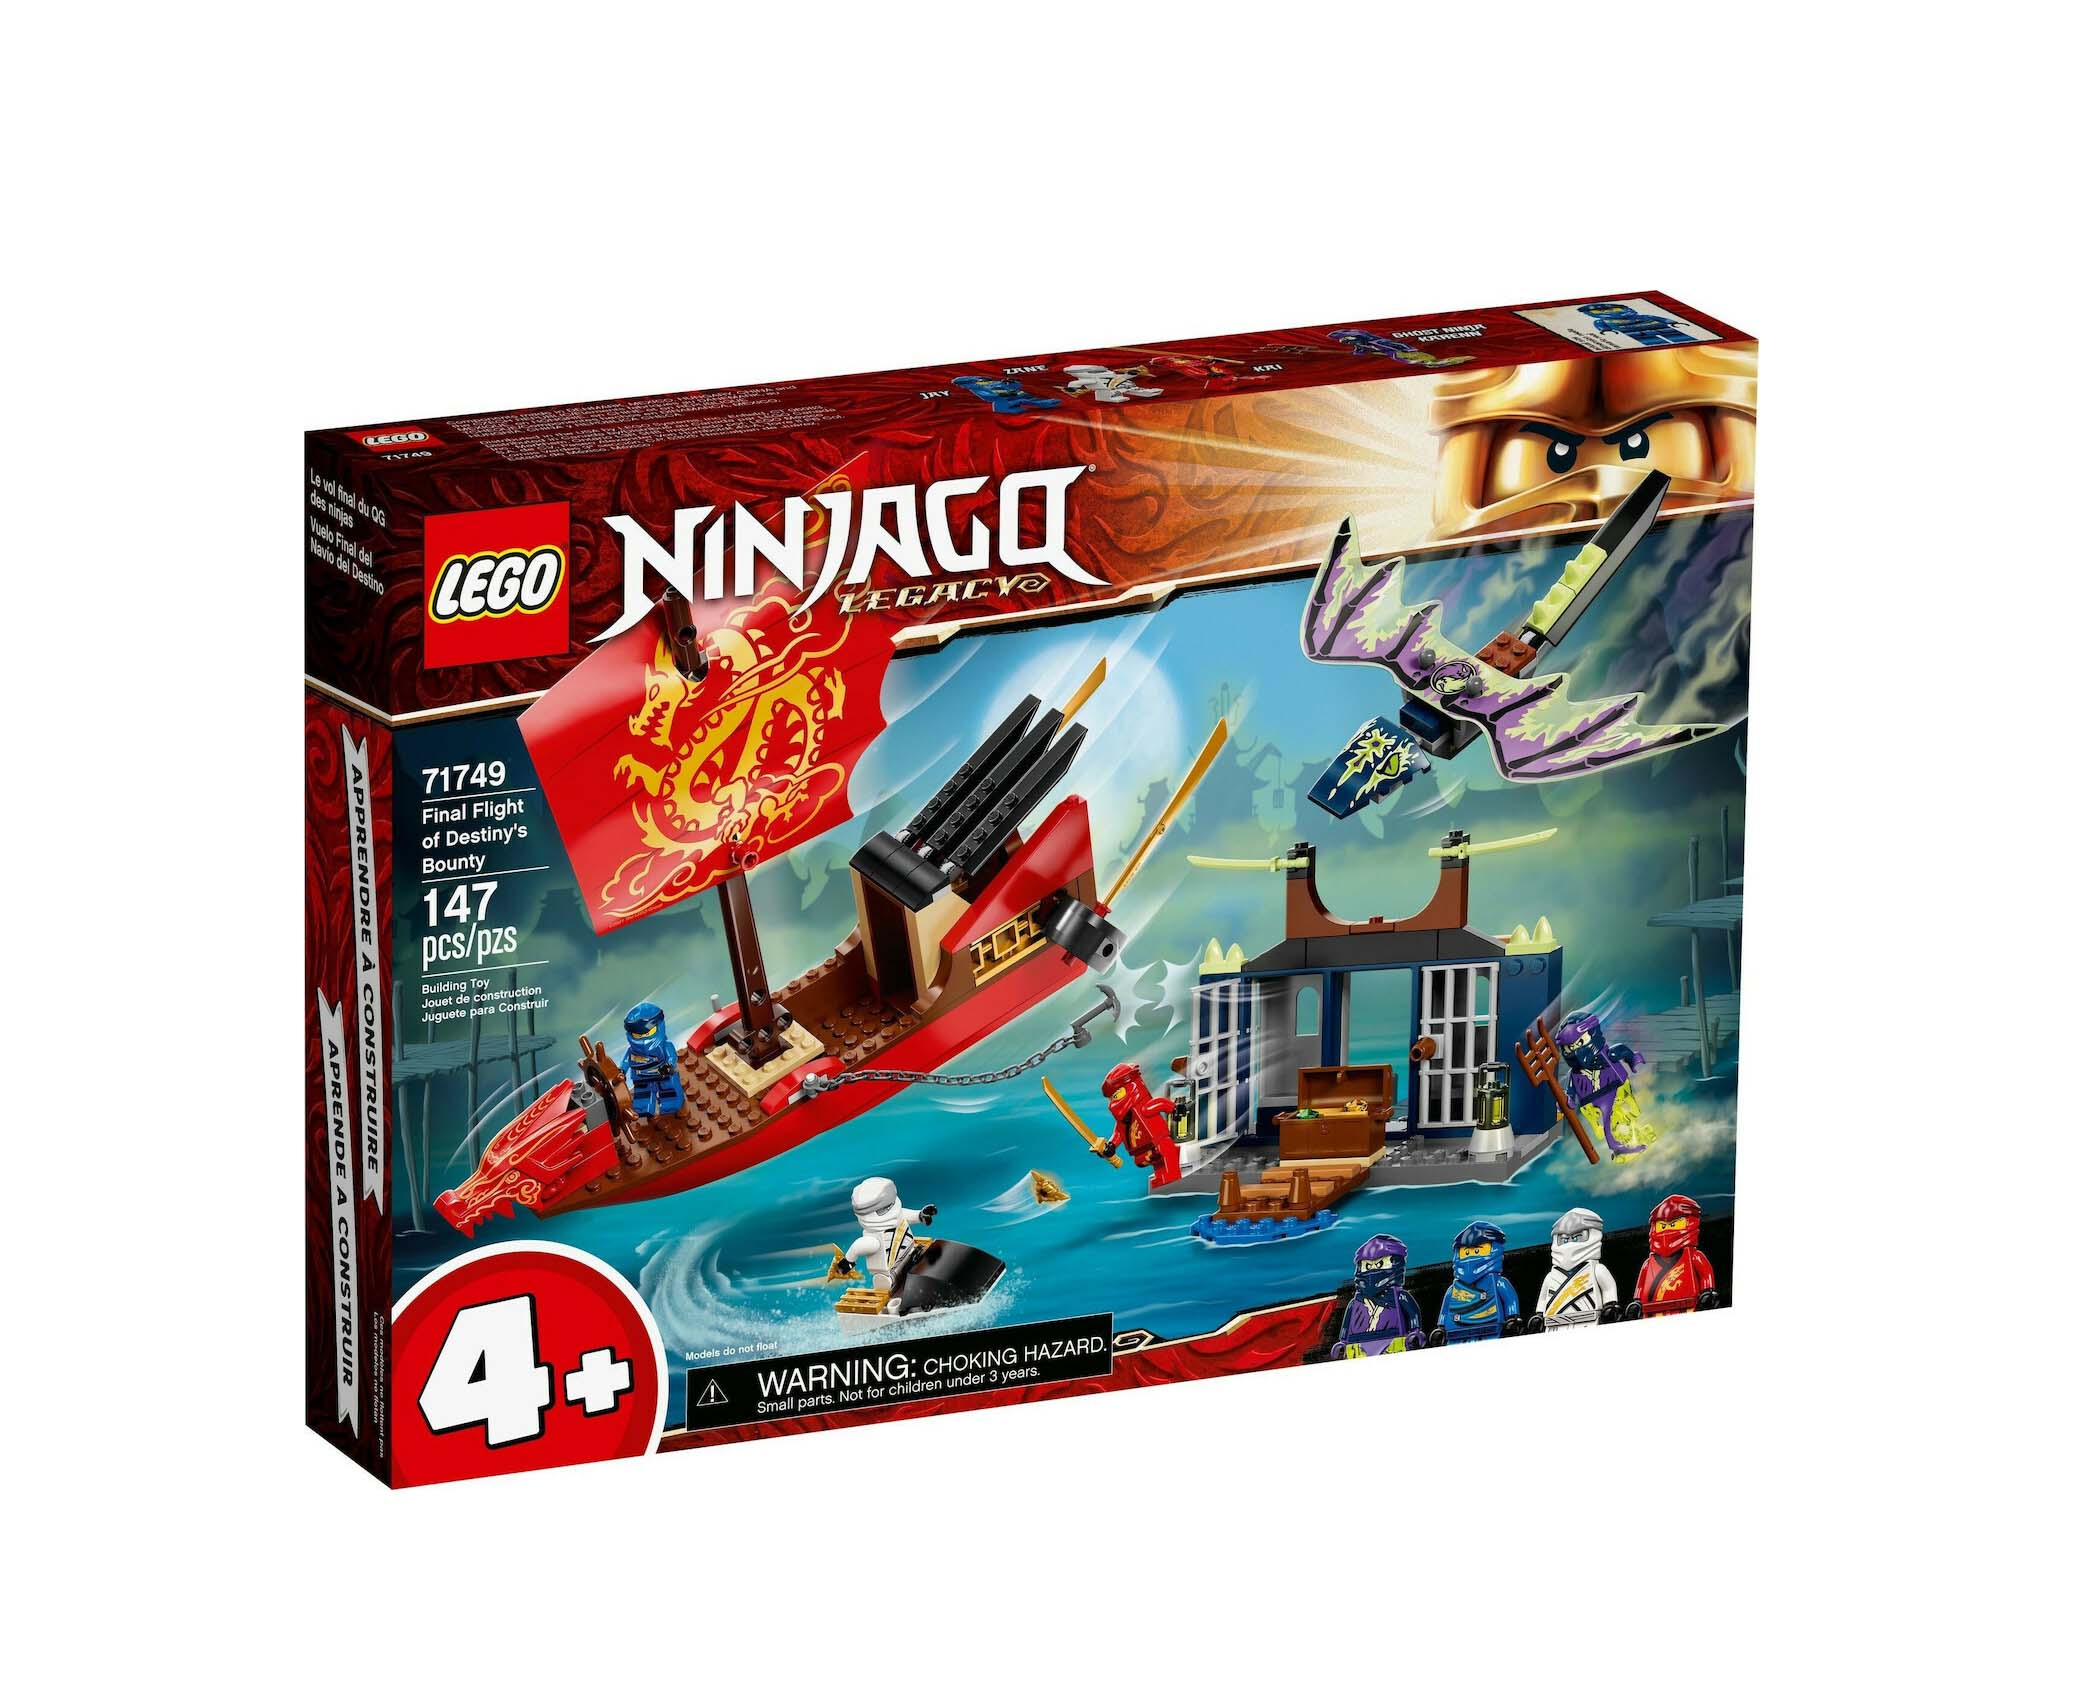 Lego Ninjago: Final Flight of Destiny's Bounty 71749